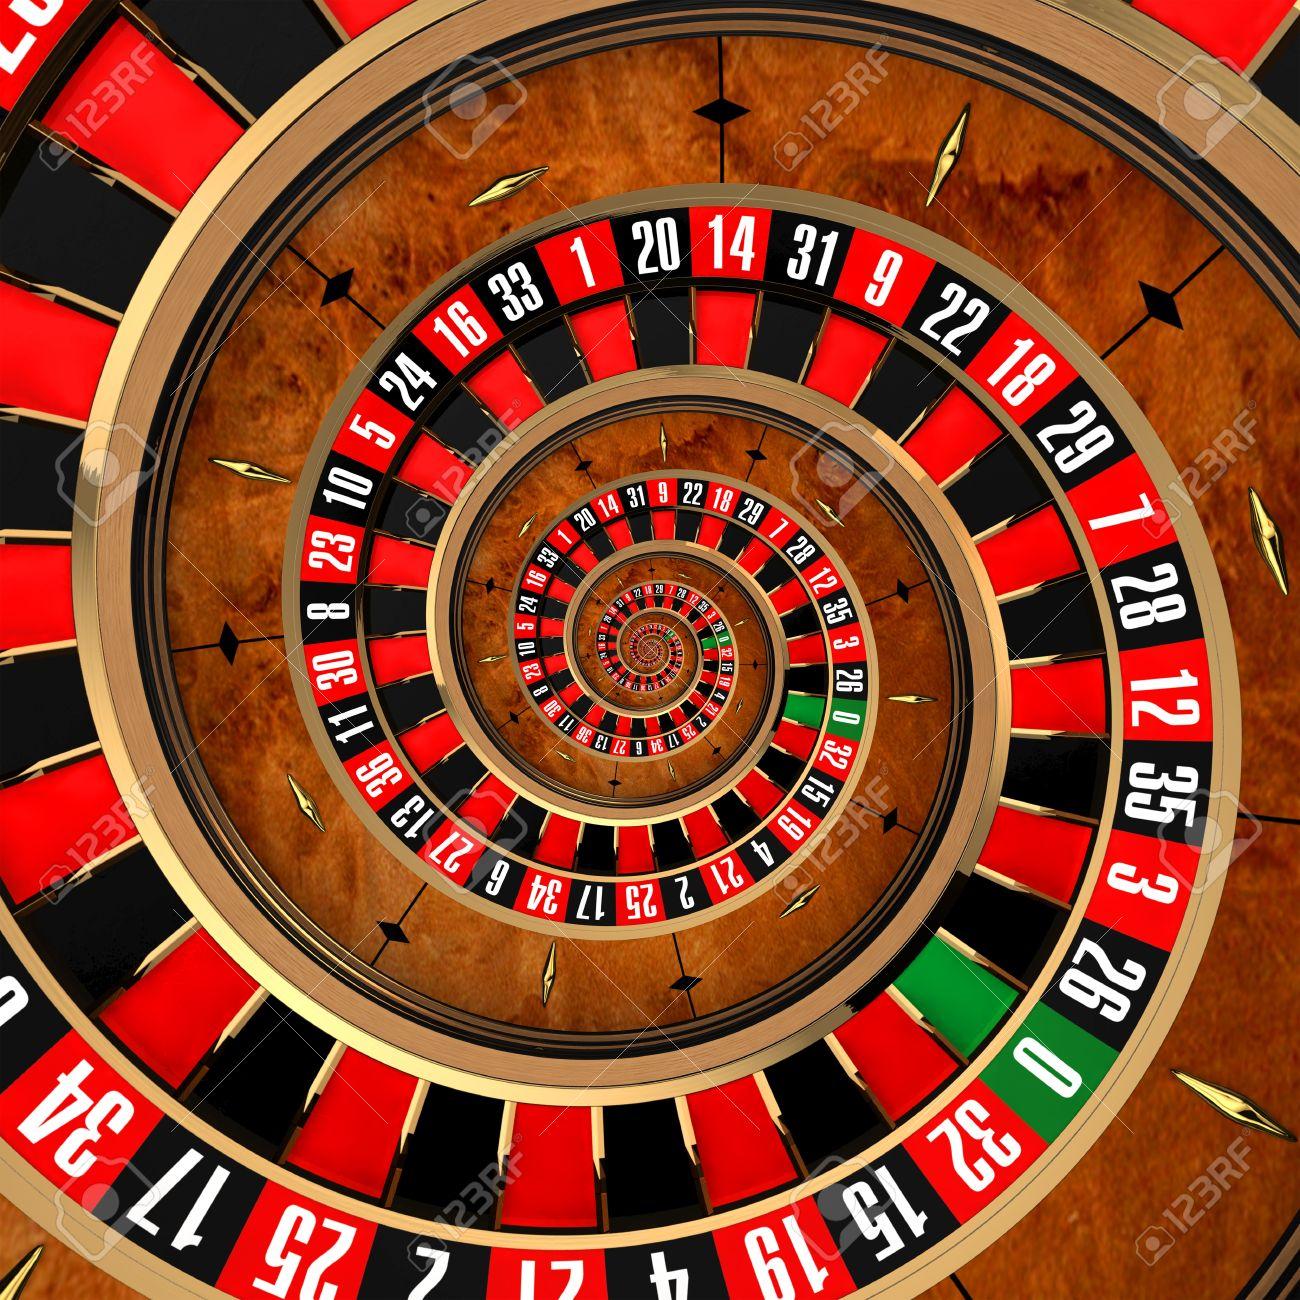 Giocatore di roulette hchste gewinnchance beim roulette